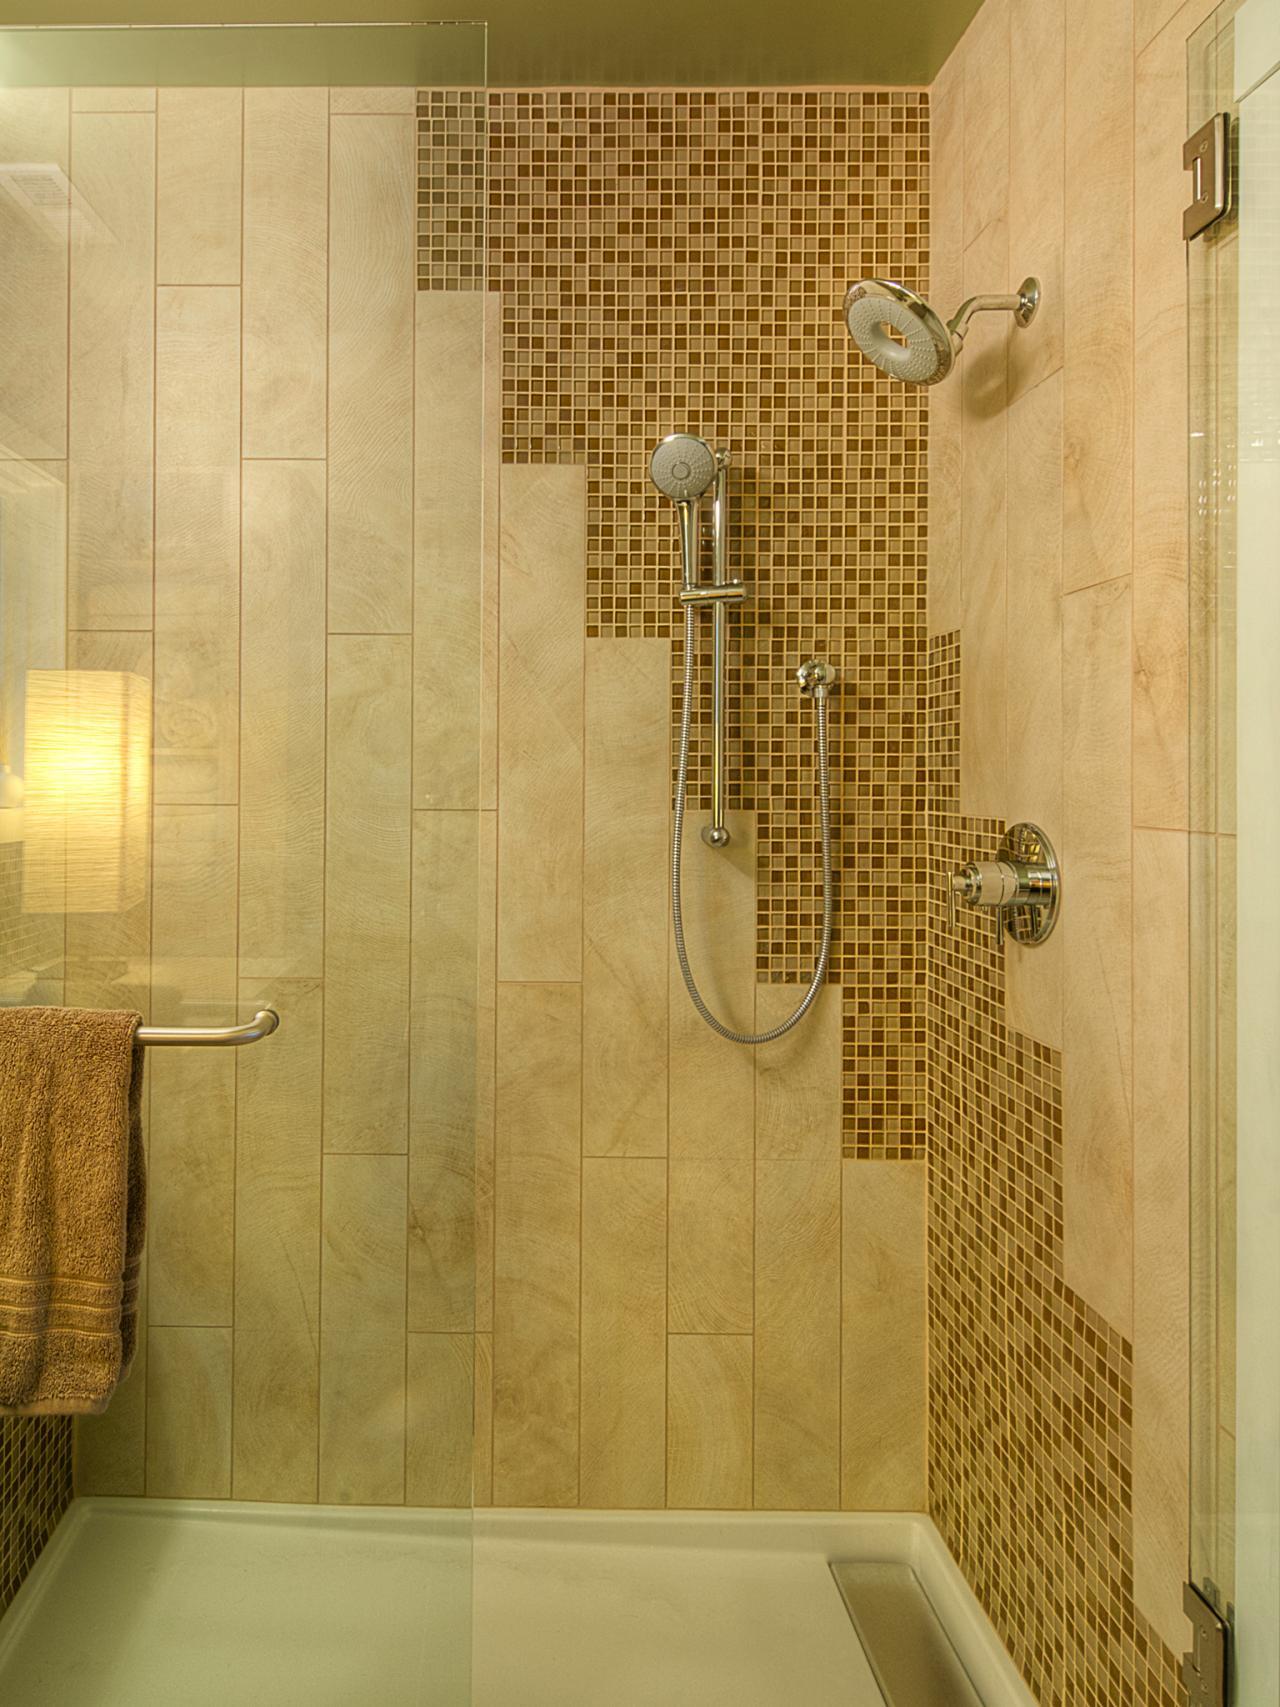 nkba 2013 bathroom mosaics meet their match  bathroom